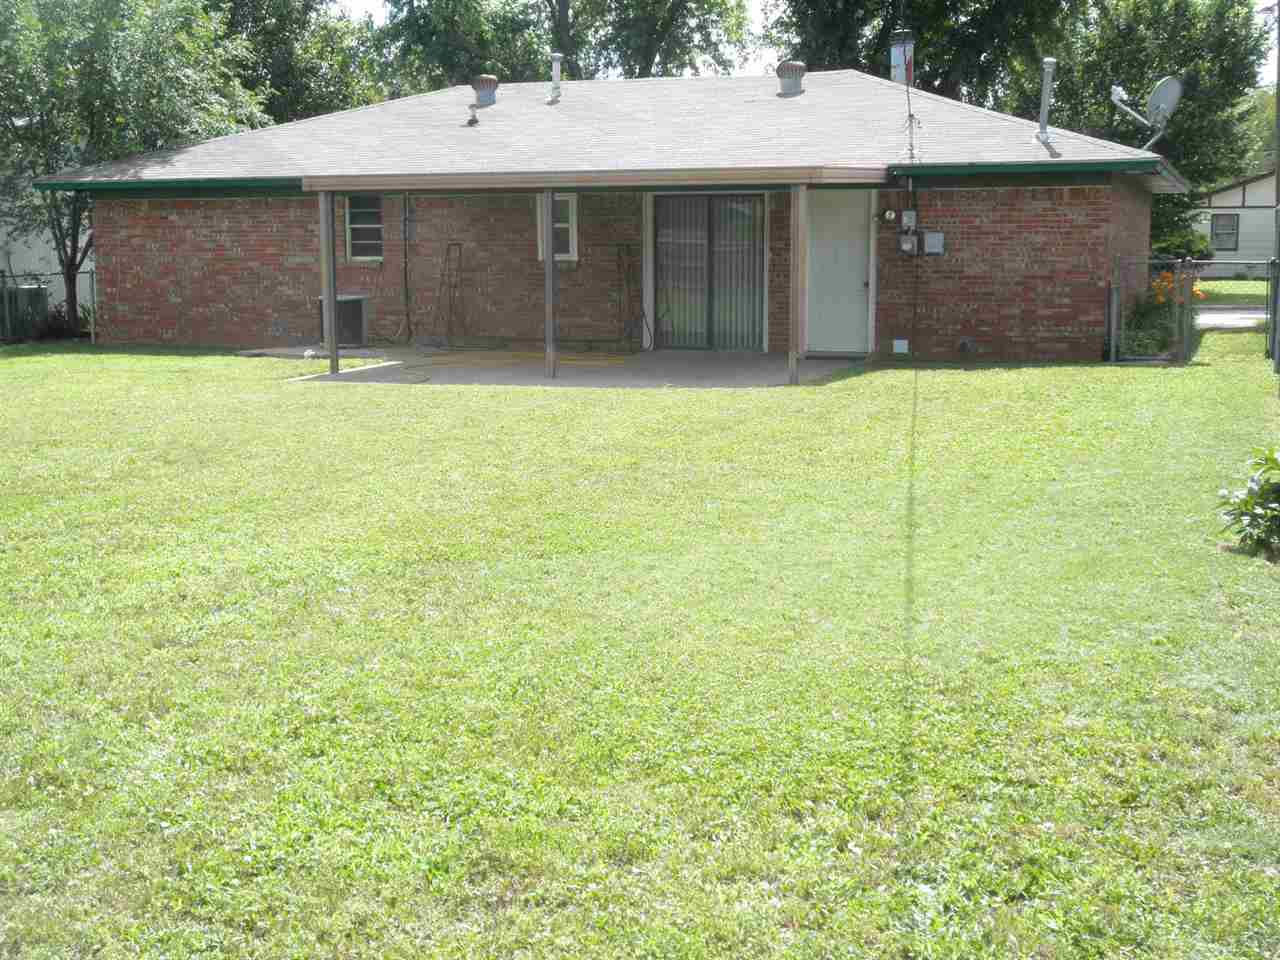 Sold Intraoffice W/MLS | 1209 N Ash Ponca City, OK 74601 16